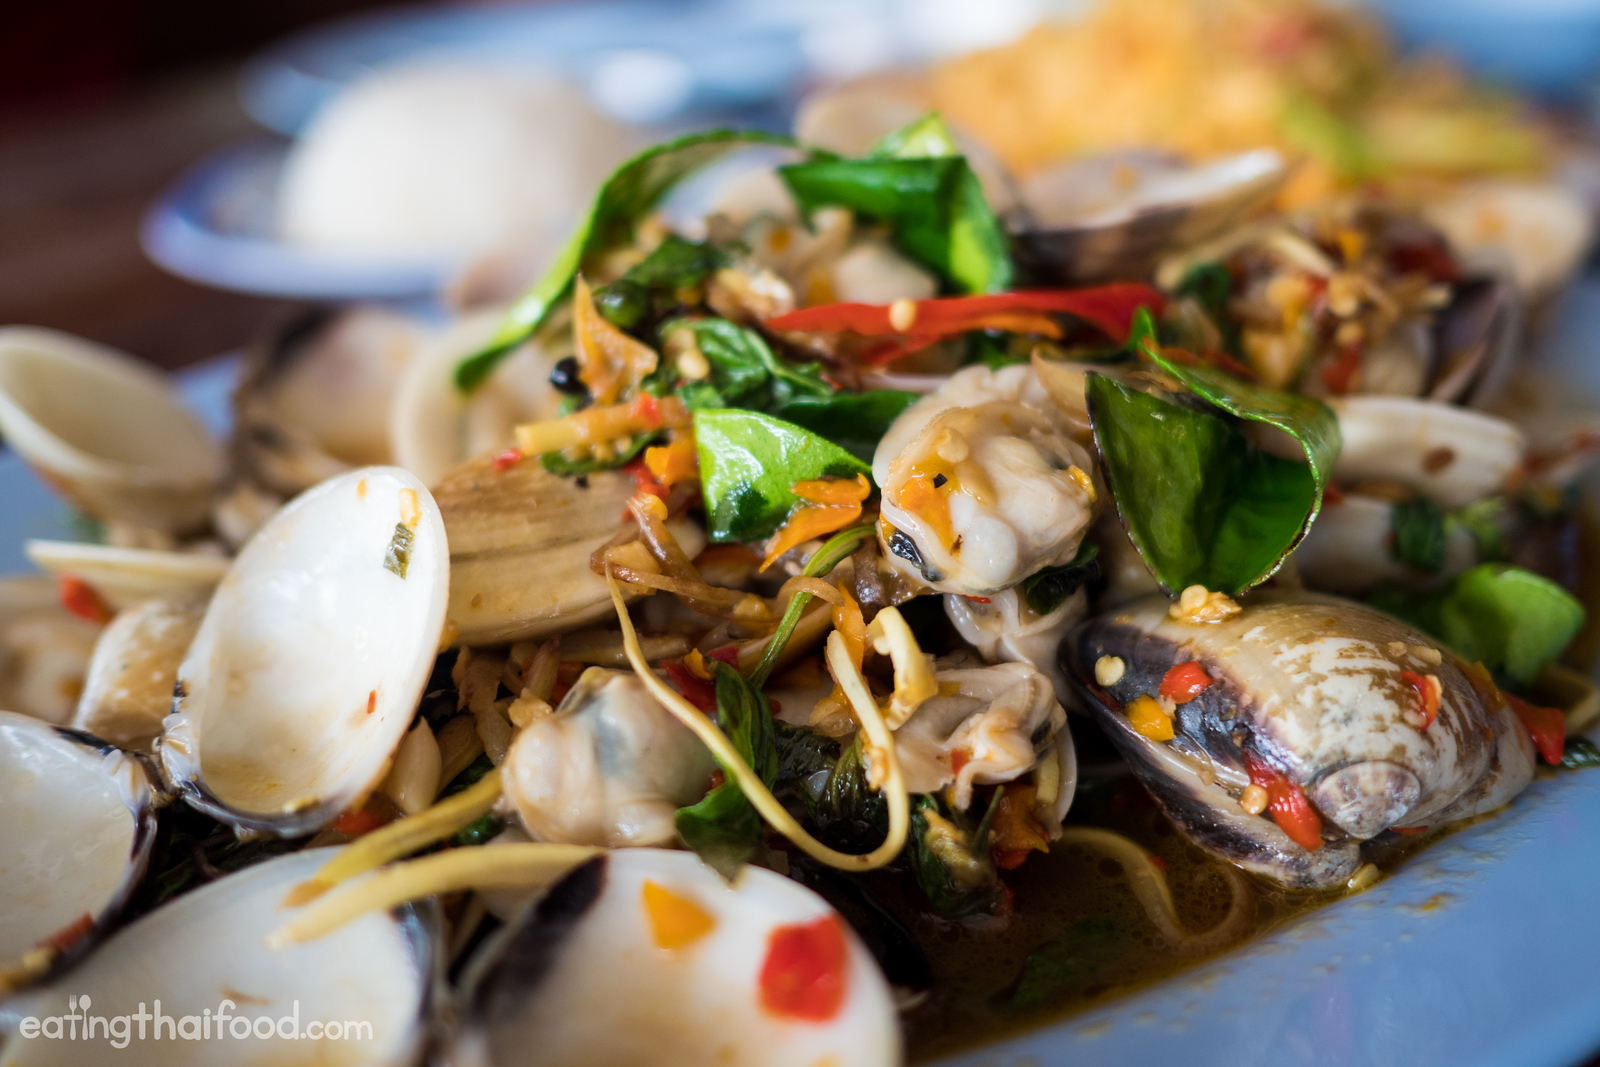 venus clams